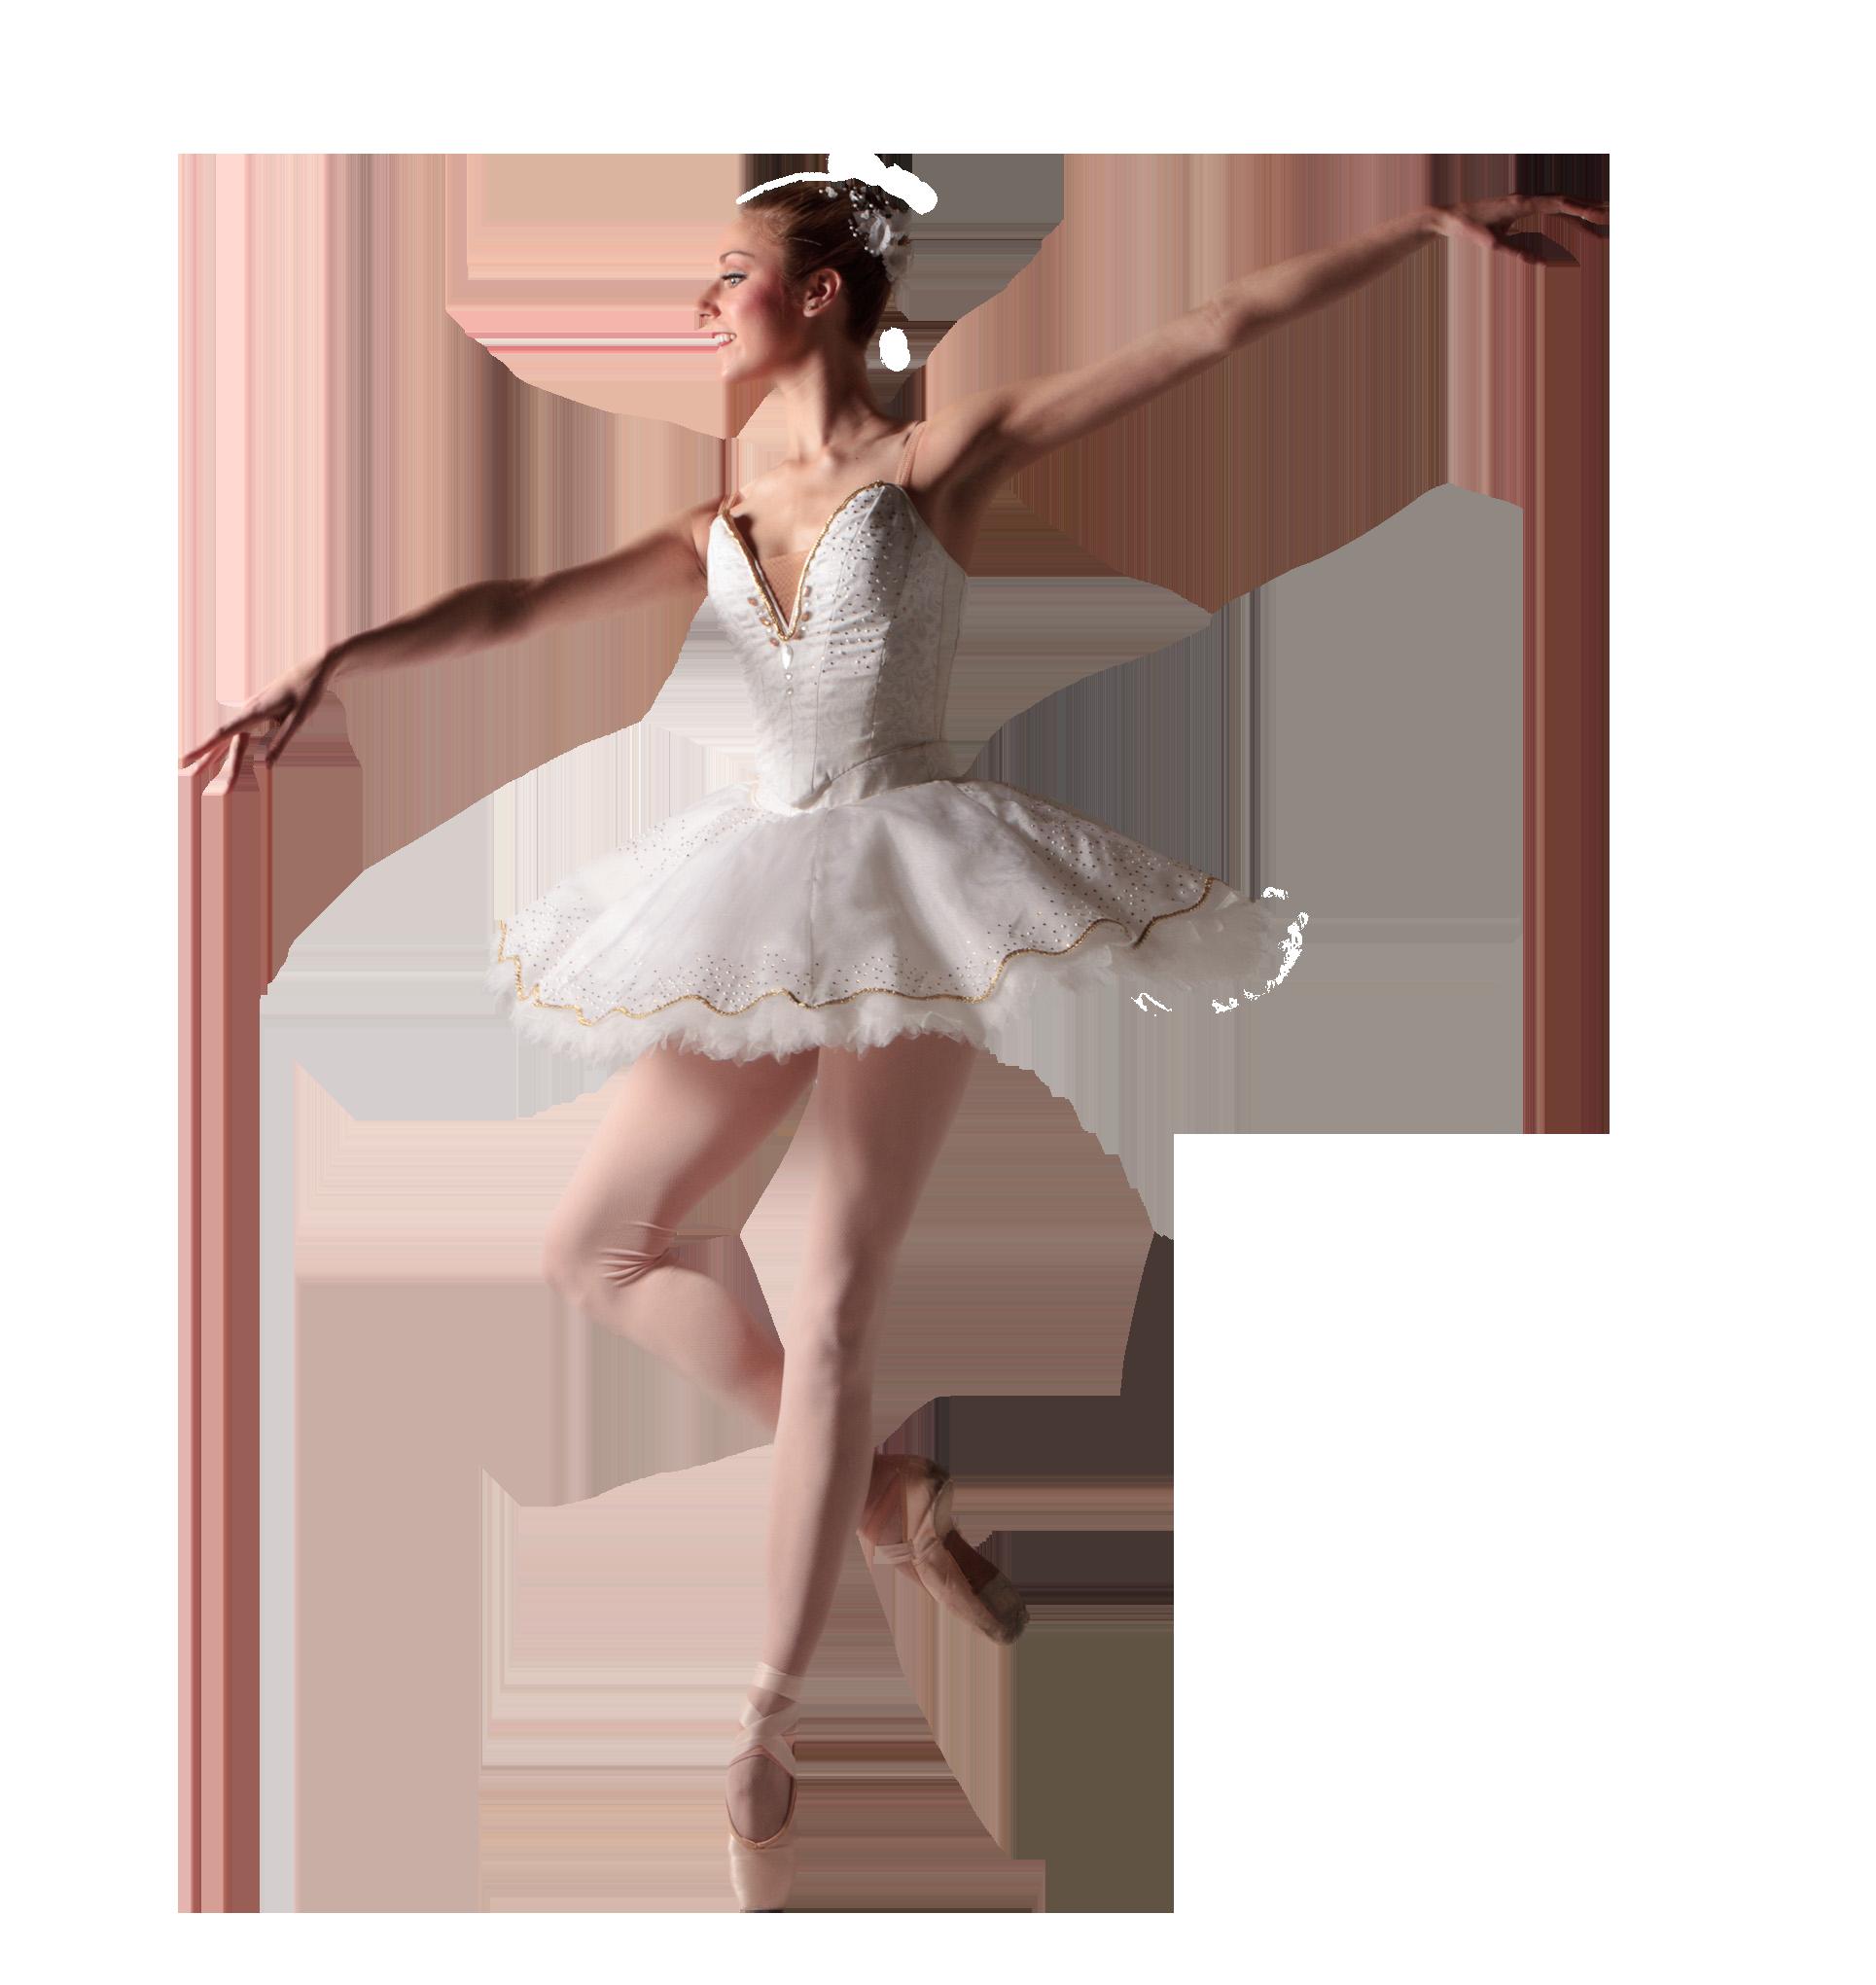 Ballerina Backgrounds on Wallpapers Vista